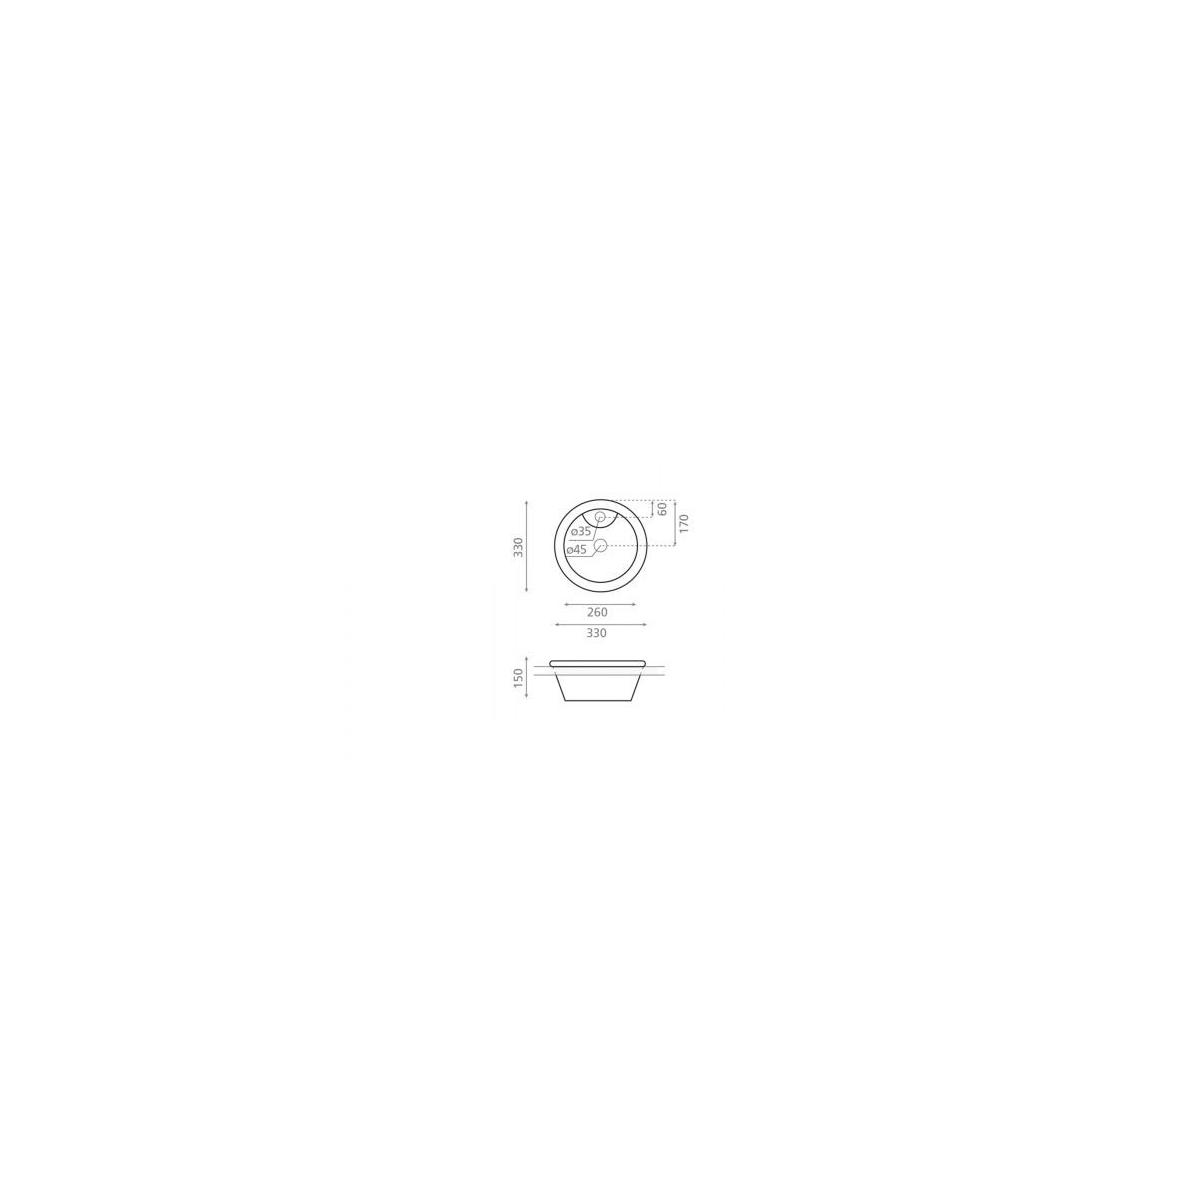 Lavabo Mini Dublin - Lavabos mini - Marca The Bathco